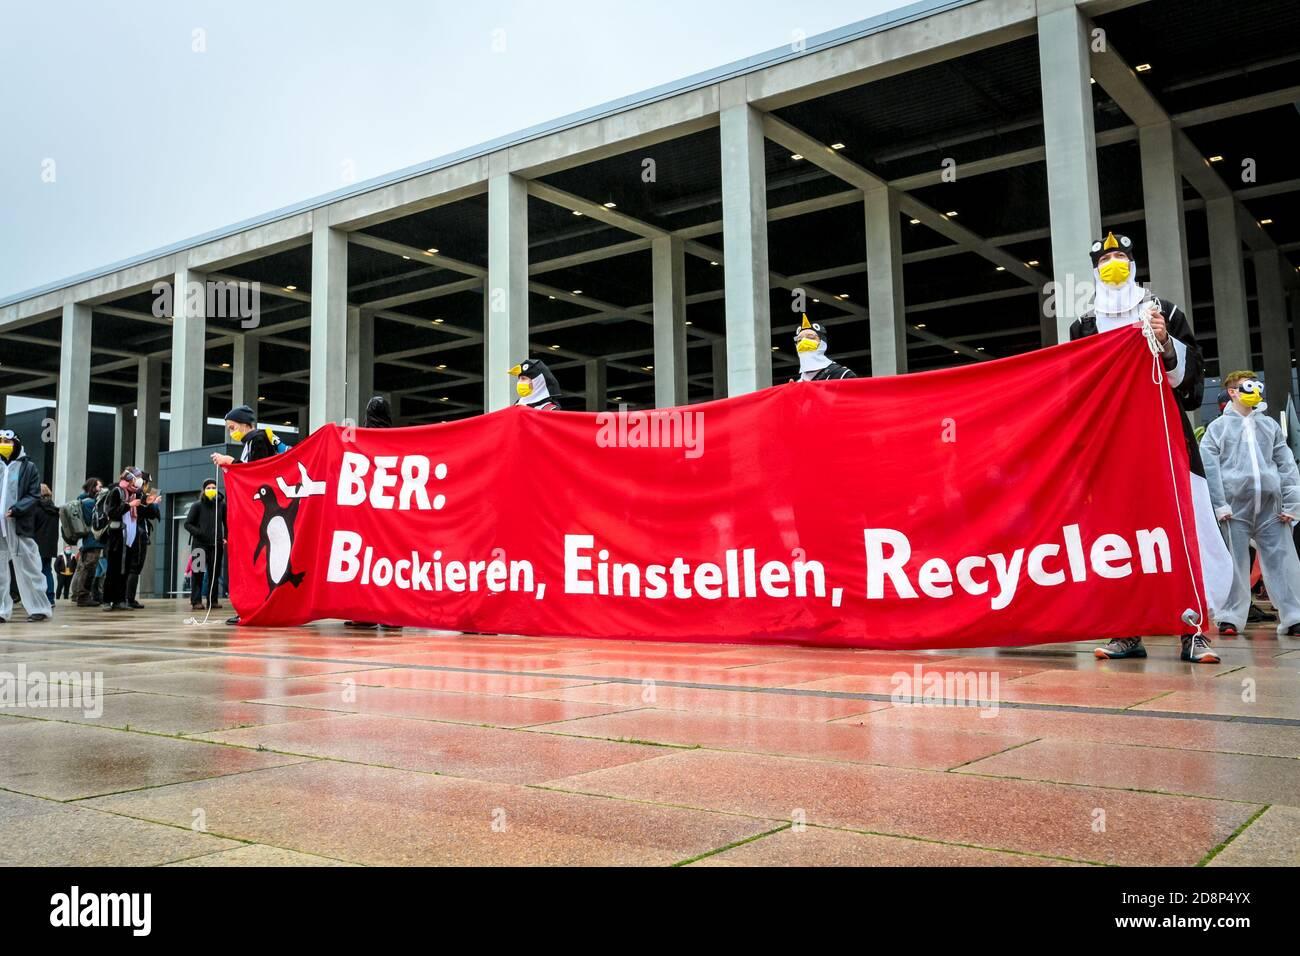 """BER: Blockieren, Einstellen, Recyclen"" sign as climate activists protest against the opening of new Berlin Brandenburg (BER) Airport. Stock Photo"